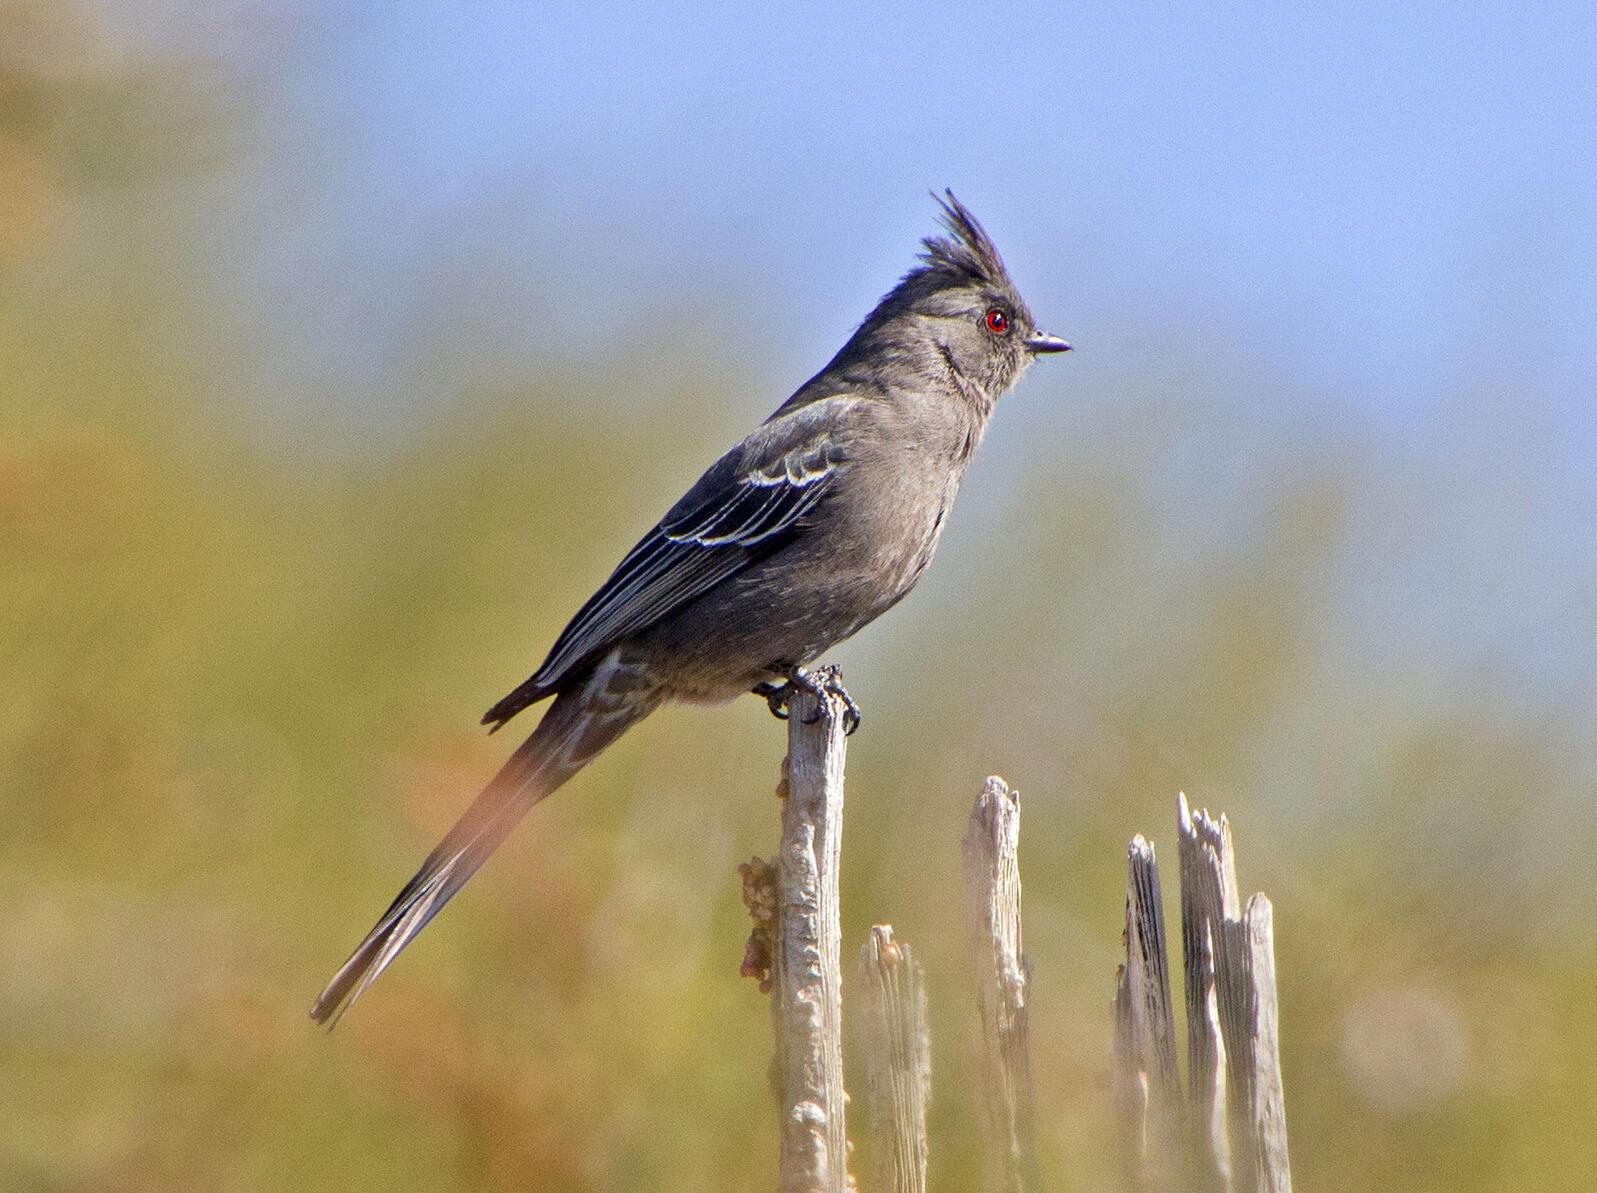 Phainopepla. Elaine Padovani/Great Backyard Bird Count